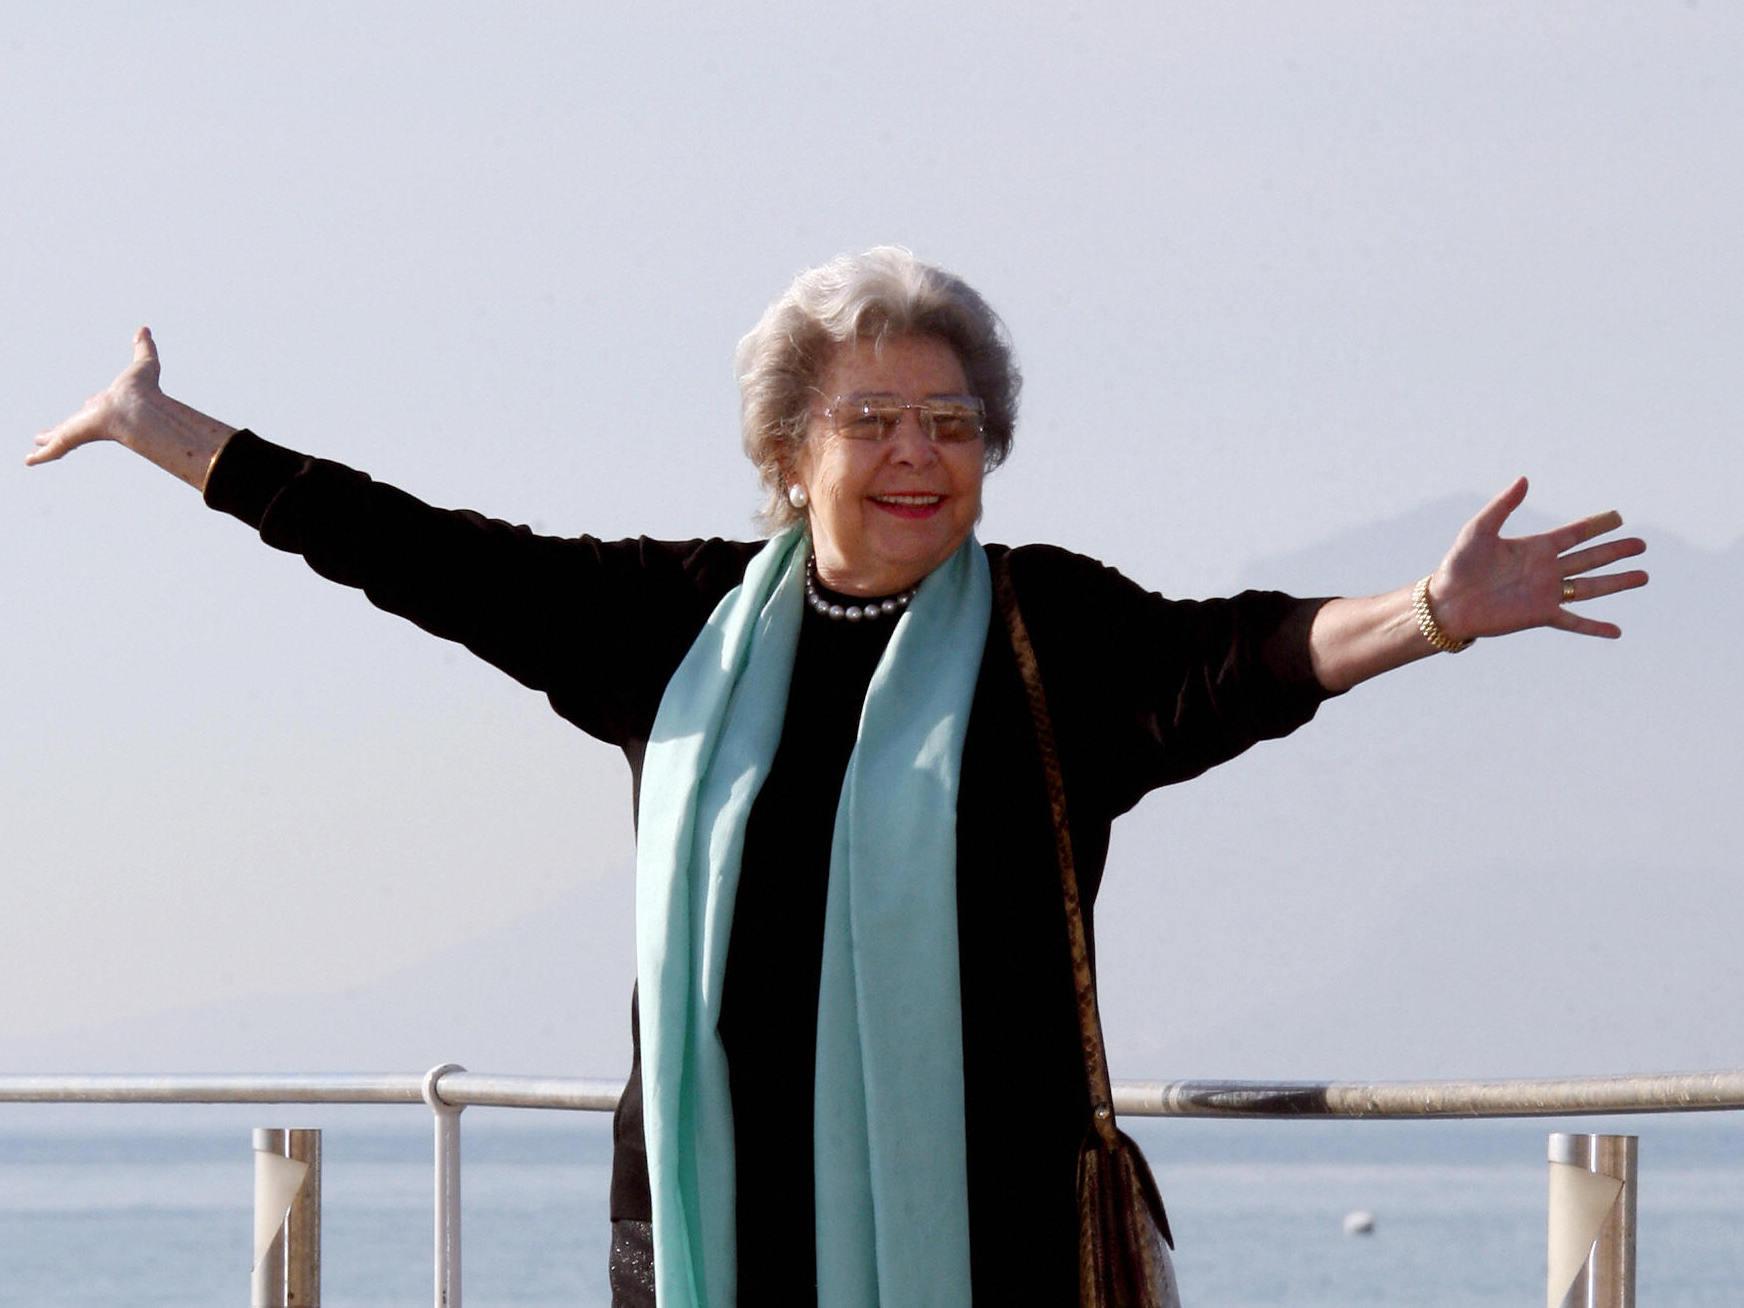 Mezzosopranistin Christa Ludwig feierte 80. Geburtstag